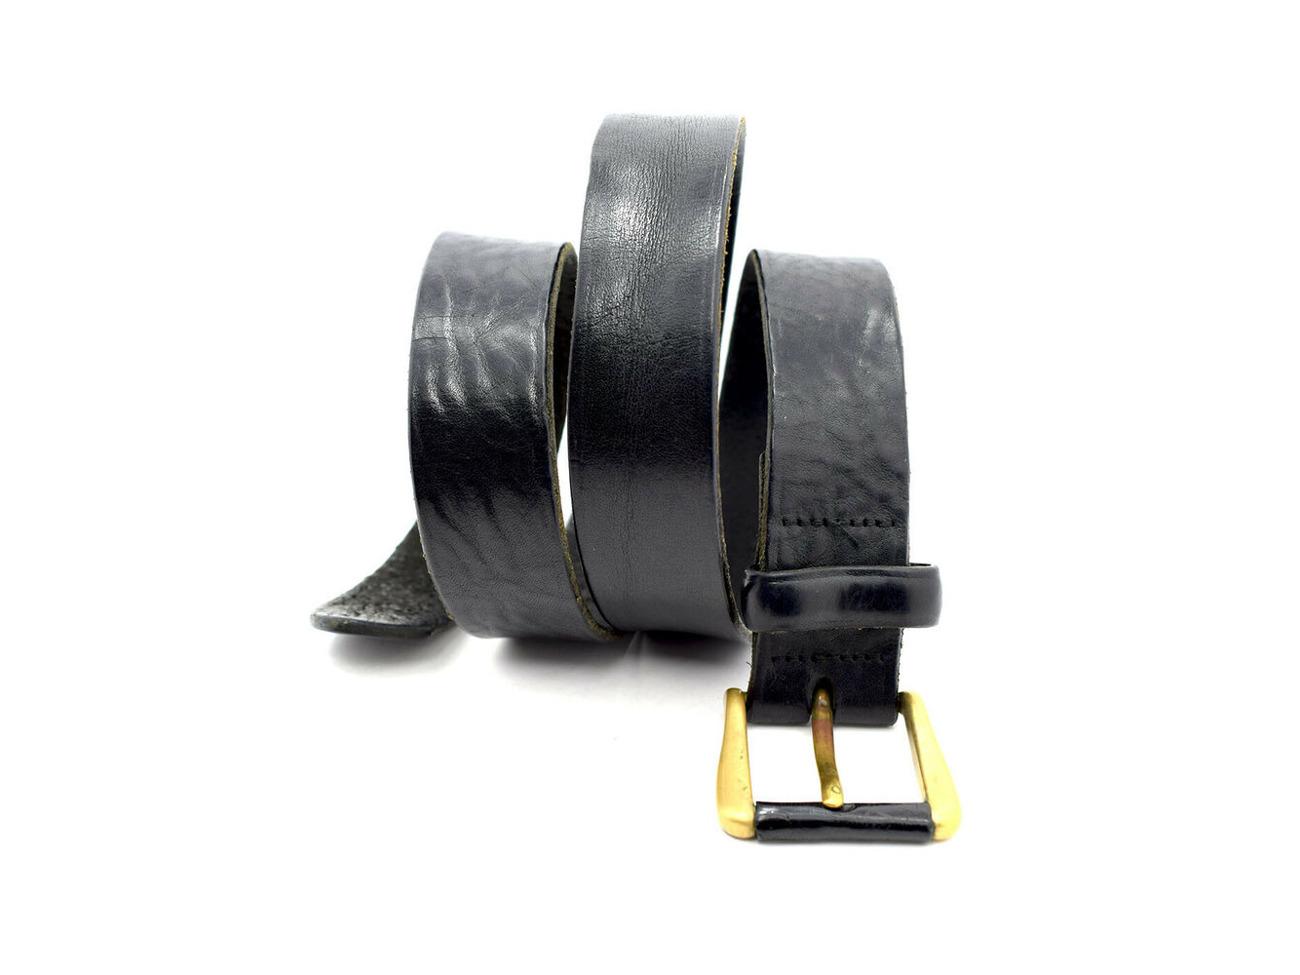 Rent Austin Reed Vintage Mens Leather Belt Black Size 34 In London Rent For 0 00 Day